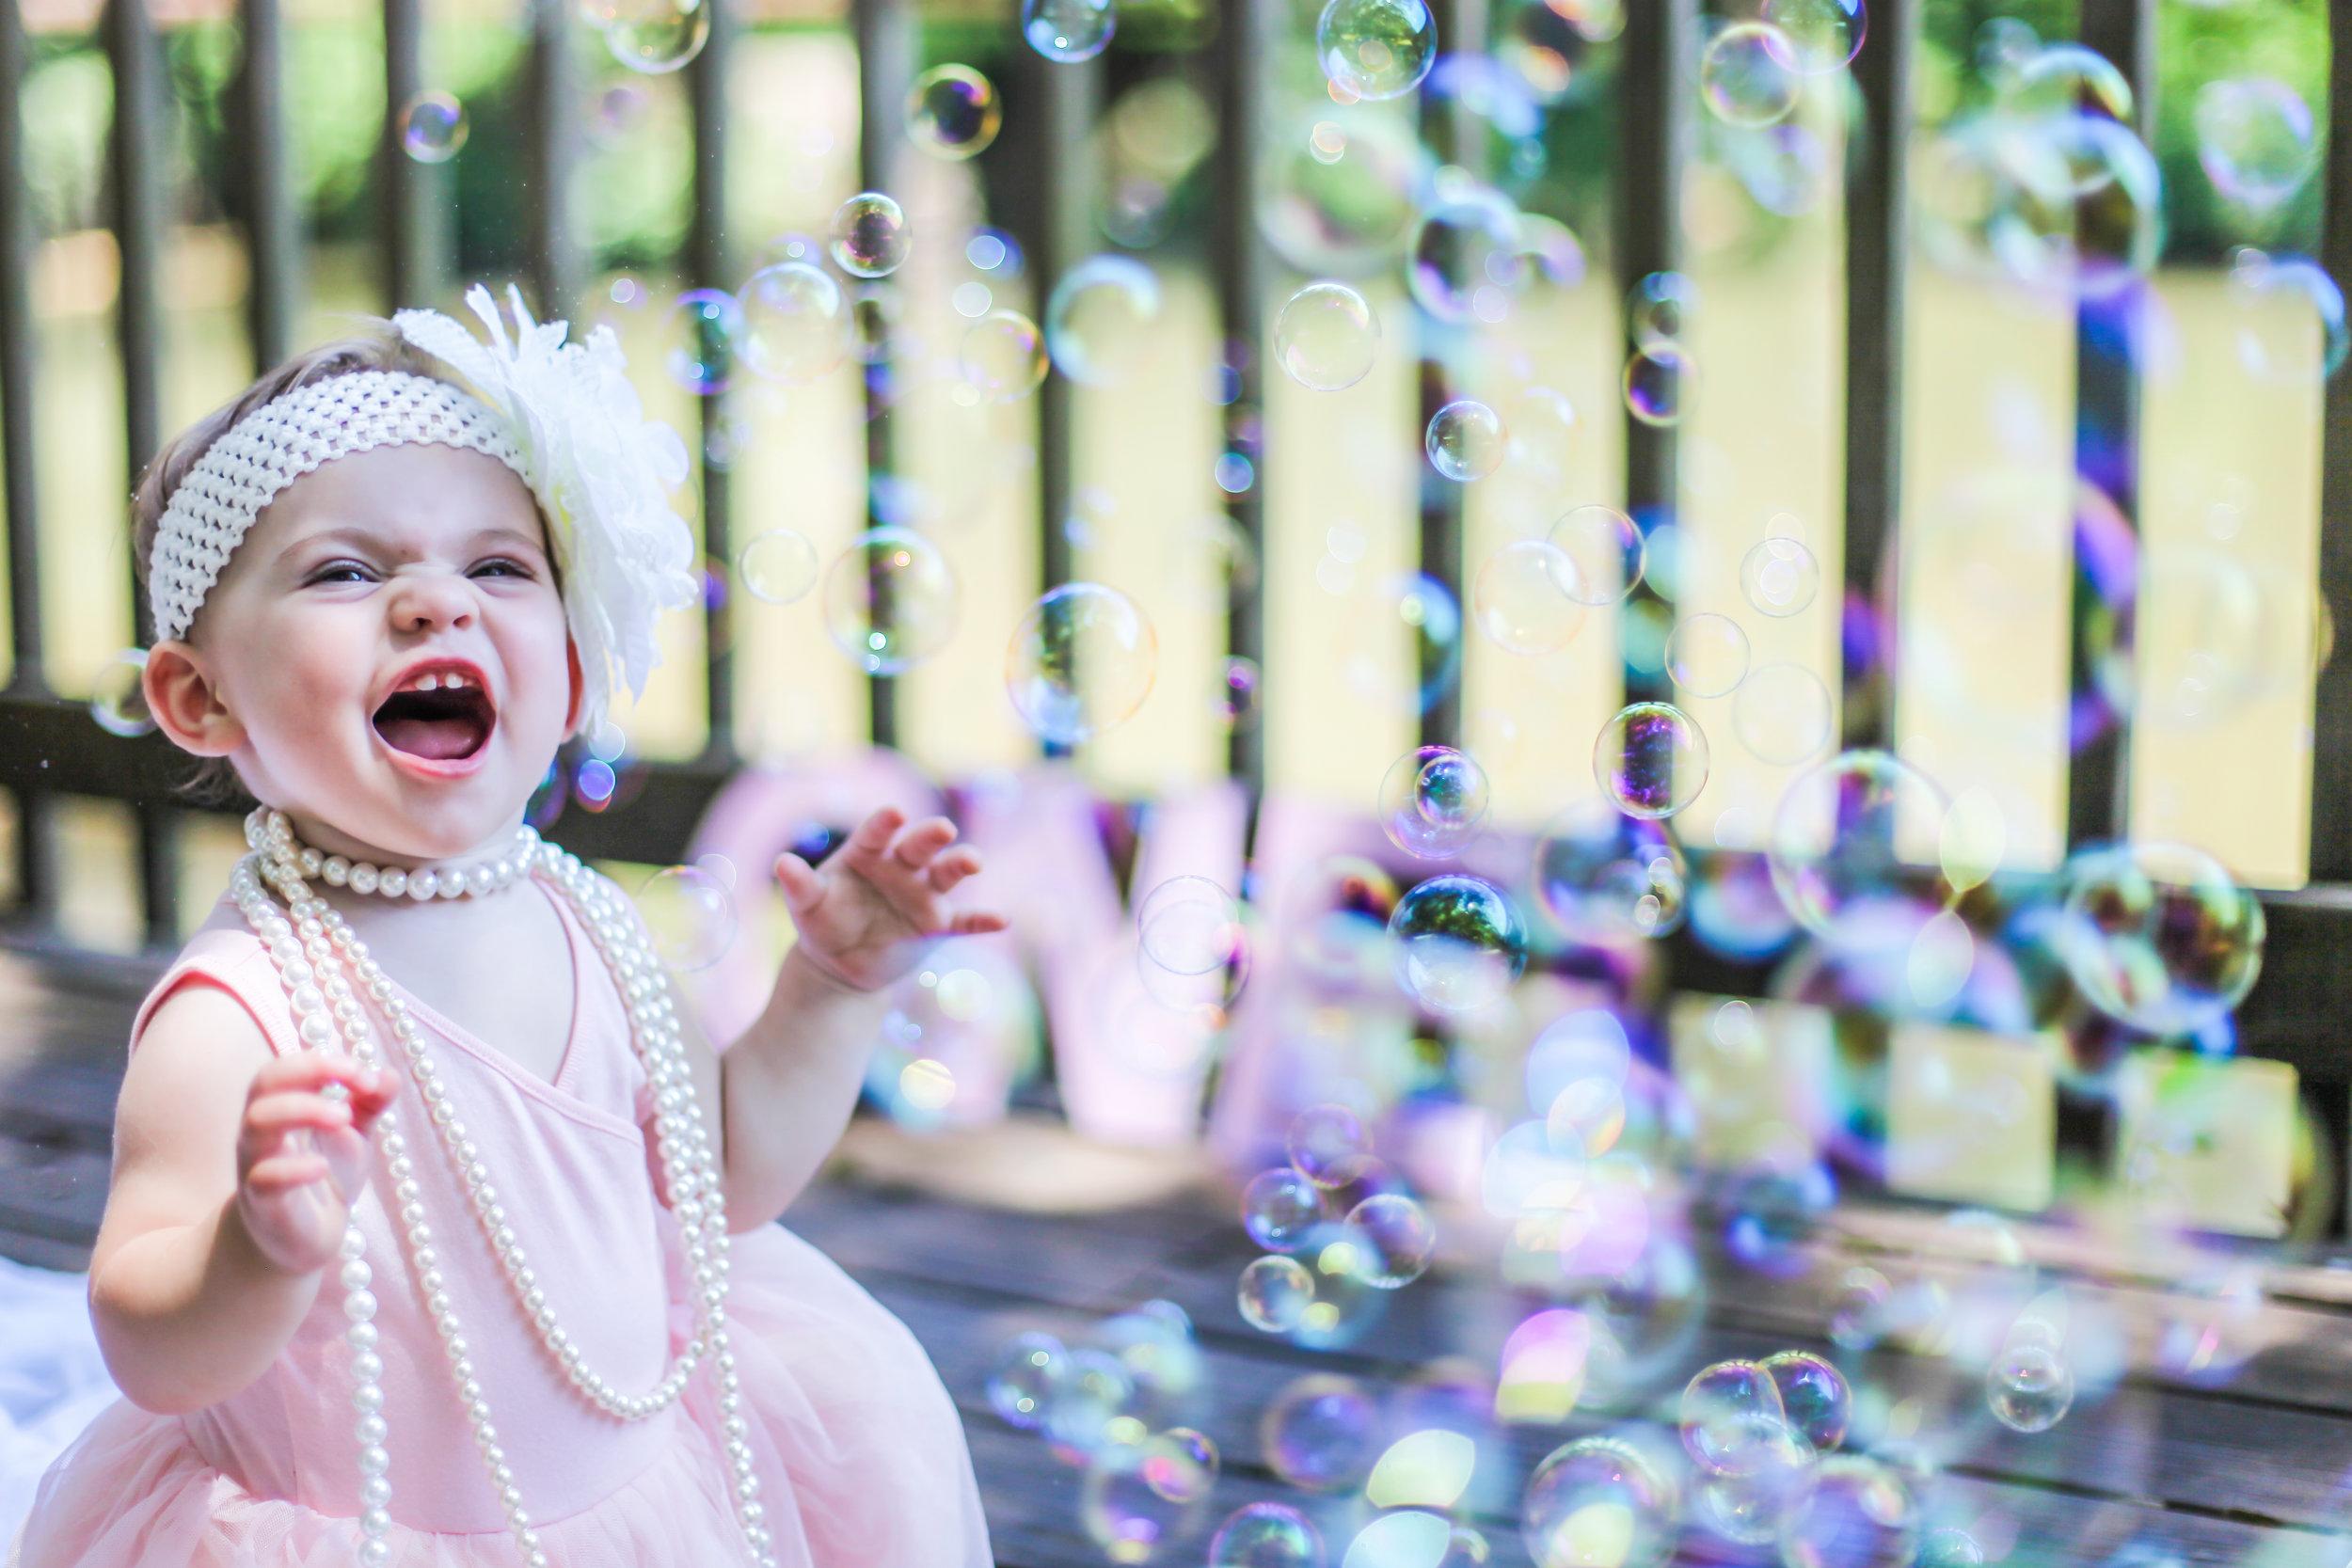 woodstock baby photography angela elliott-67.jpg